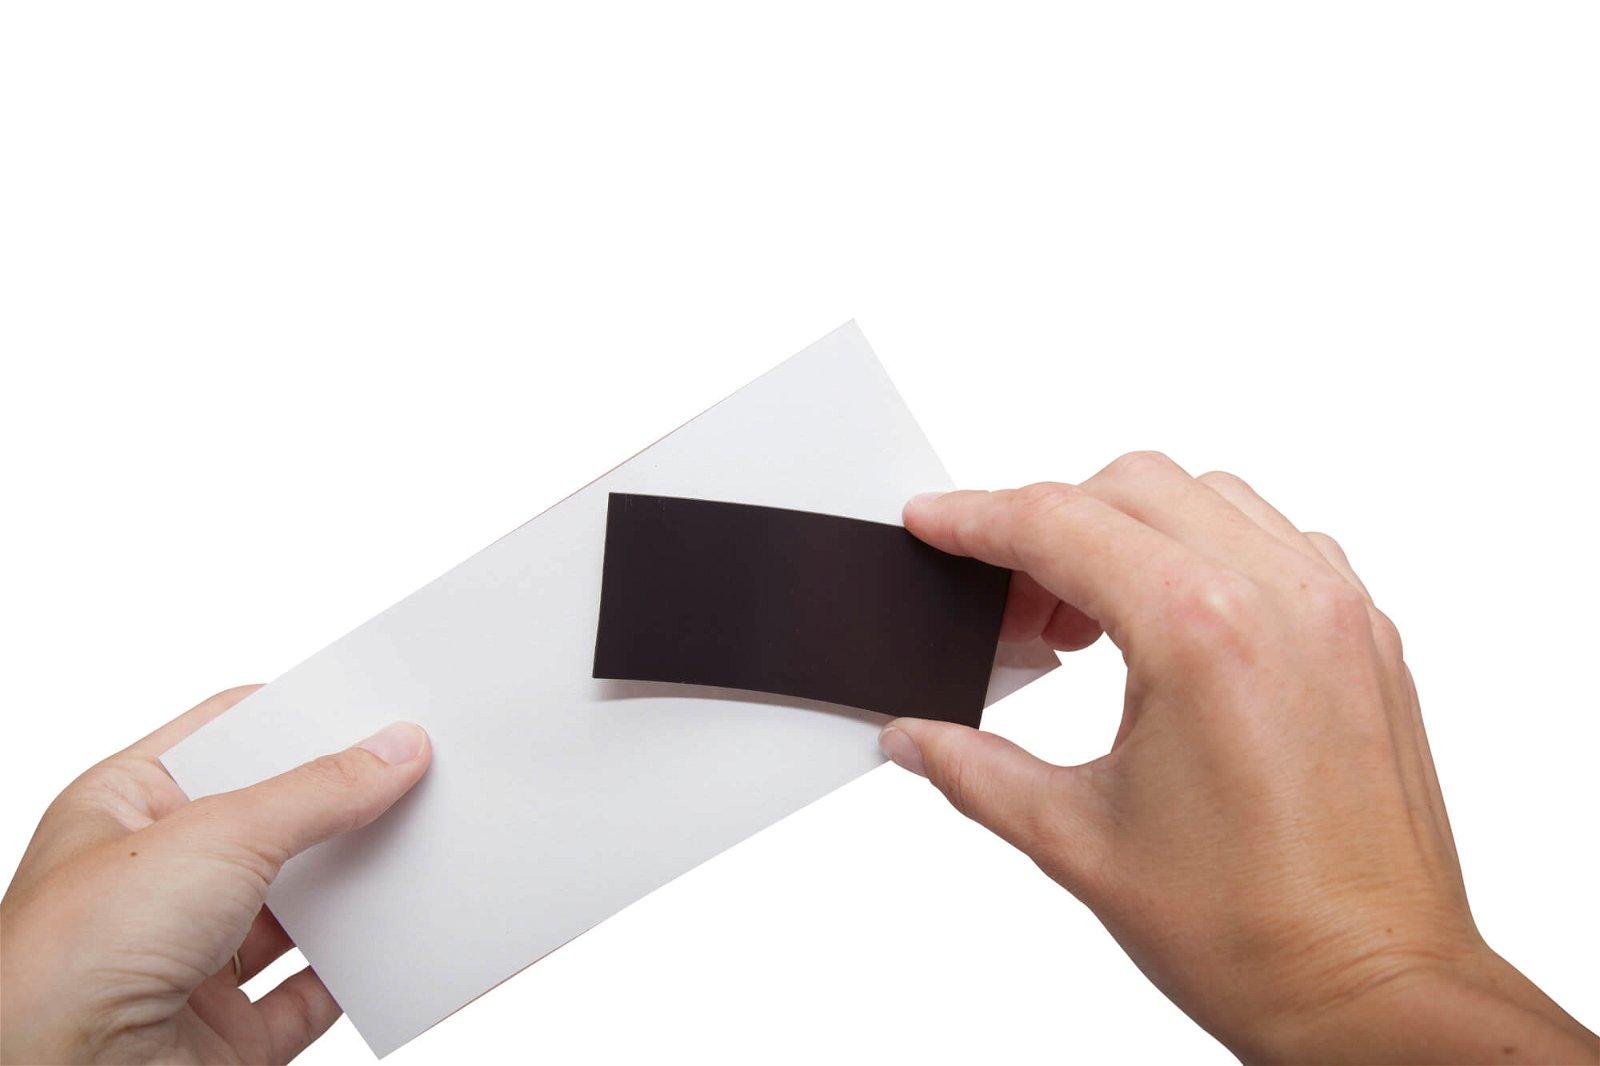 Magnetband selbstklebend, 10 m x 45 mm x 1 mm, sonstige